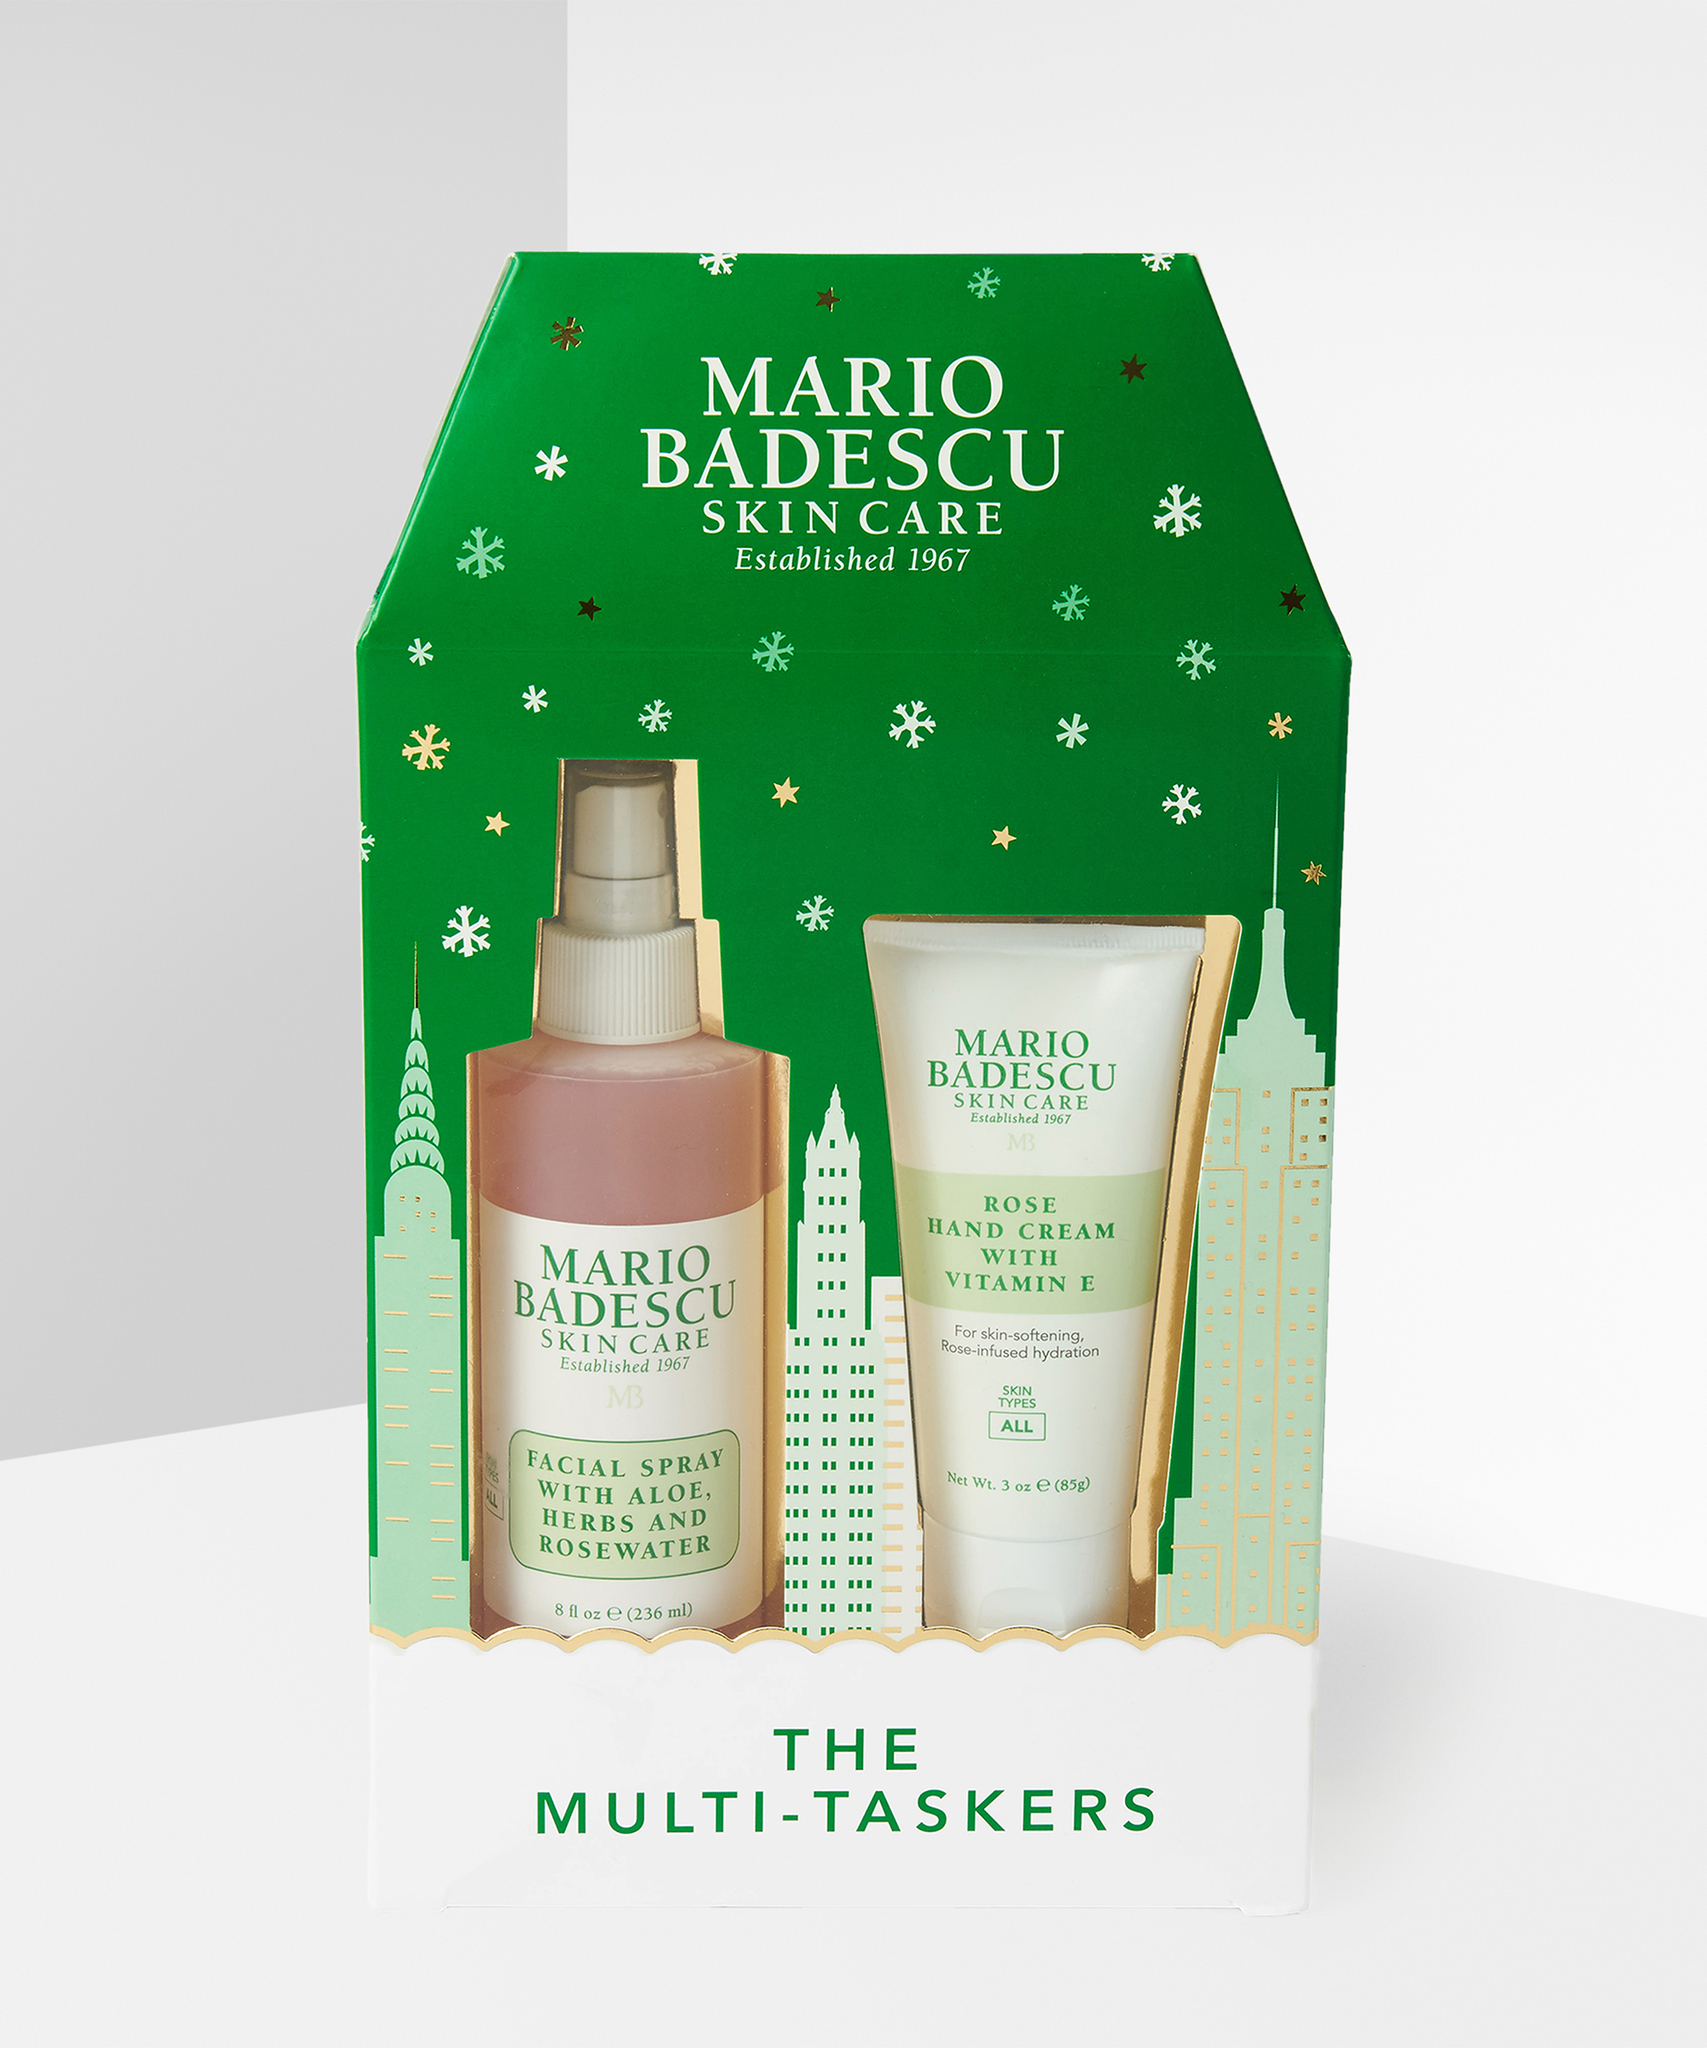 Набор Mario Badescu The Multi-Taskers